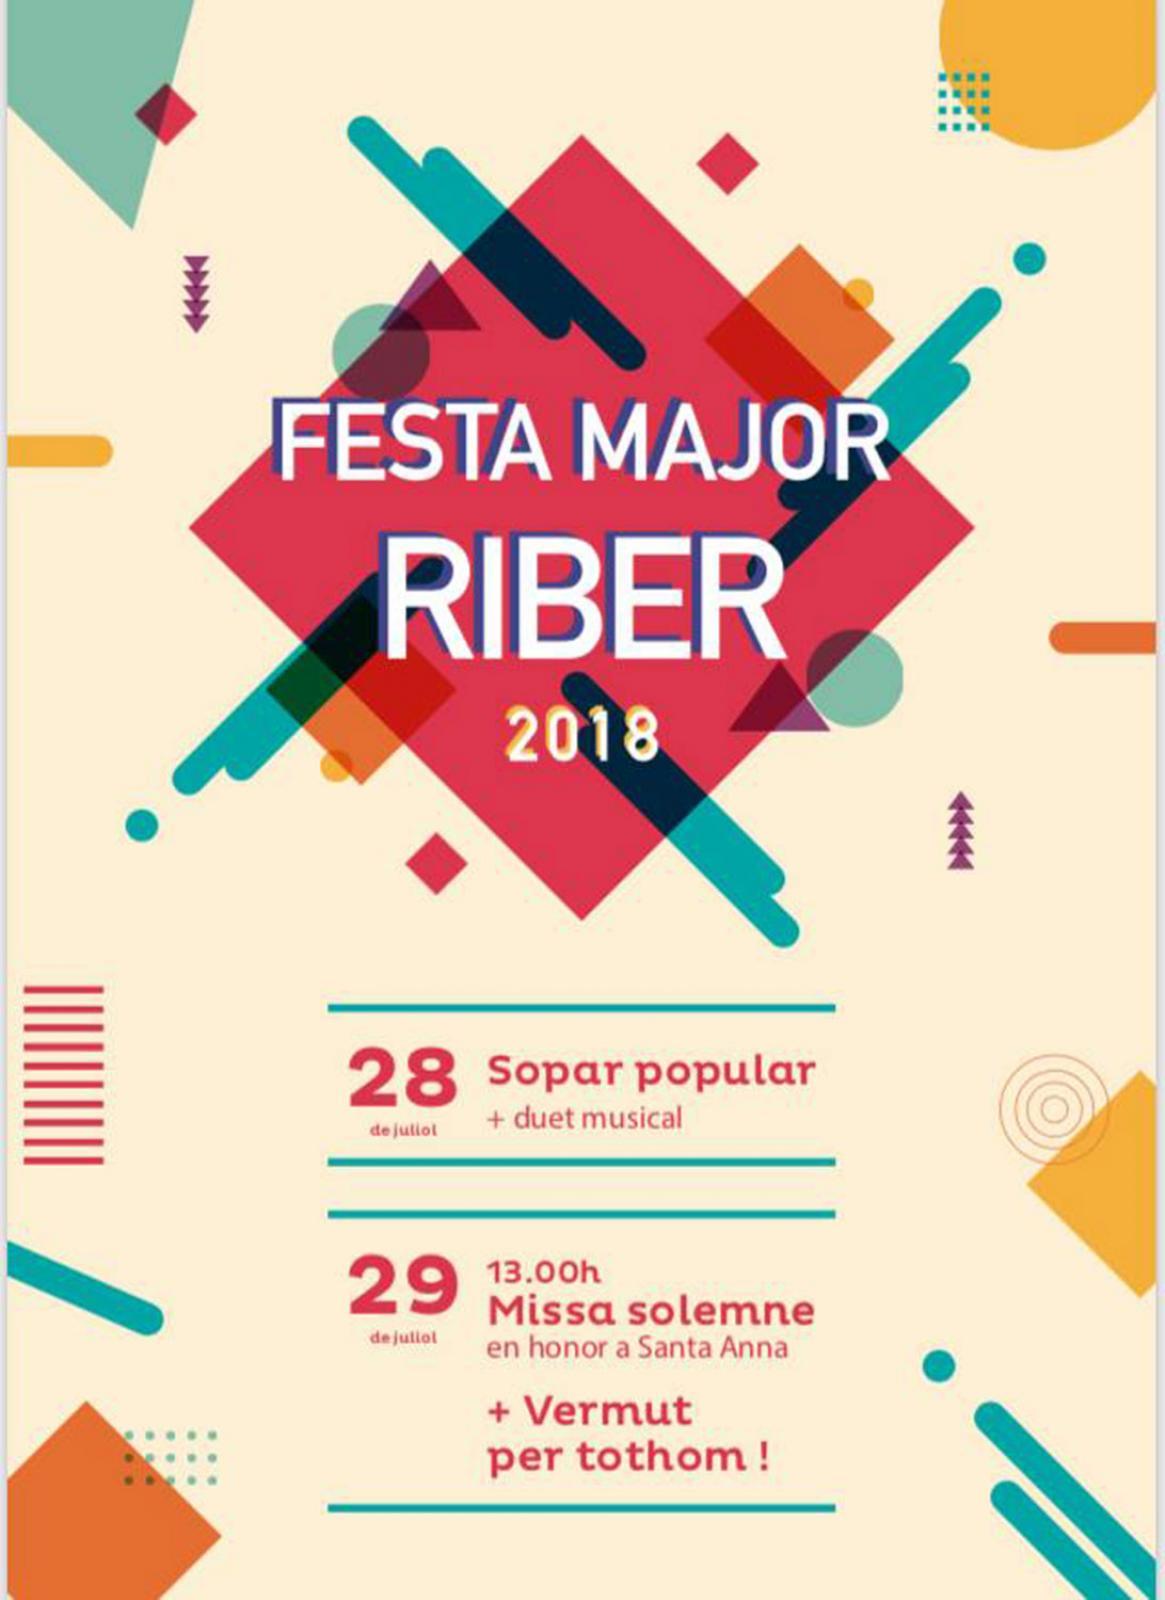 Festa major de Riber 2018